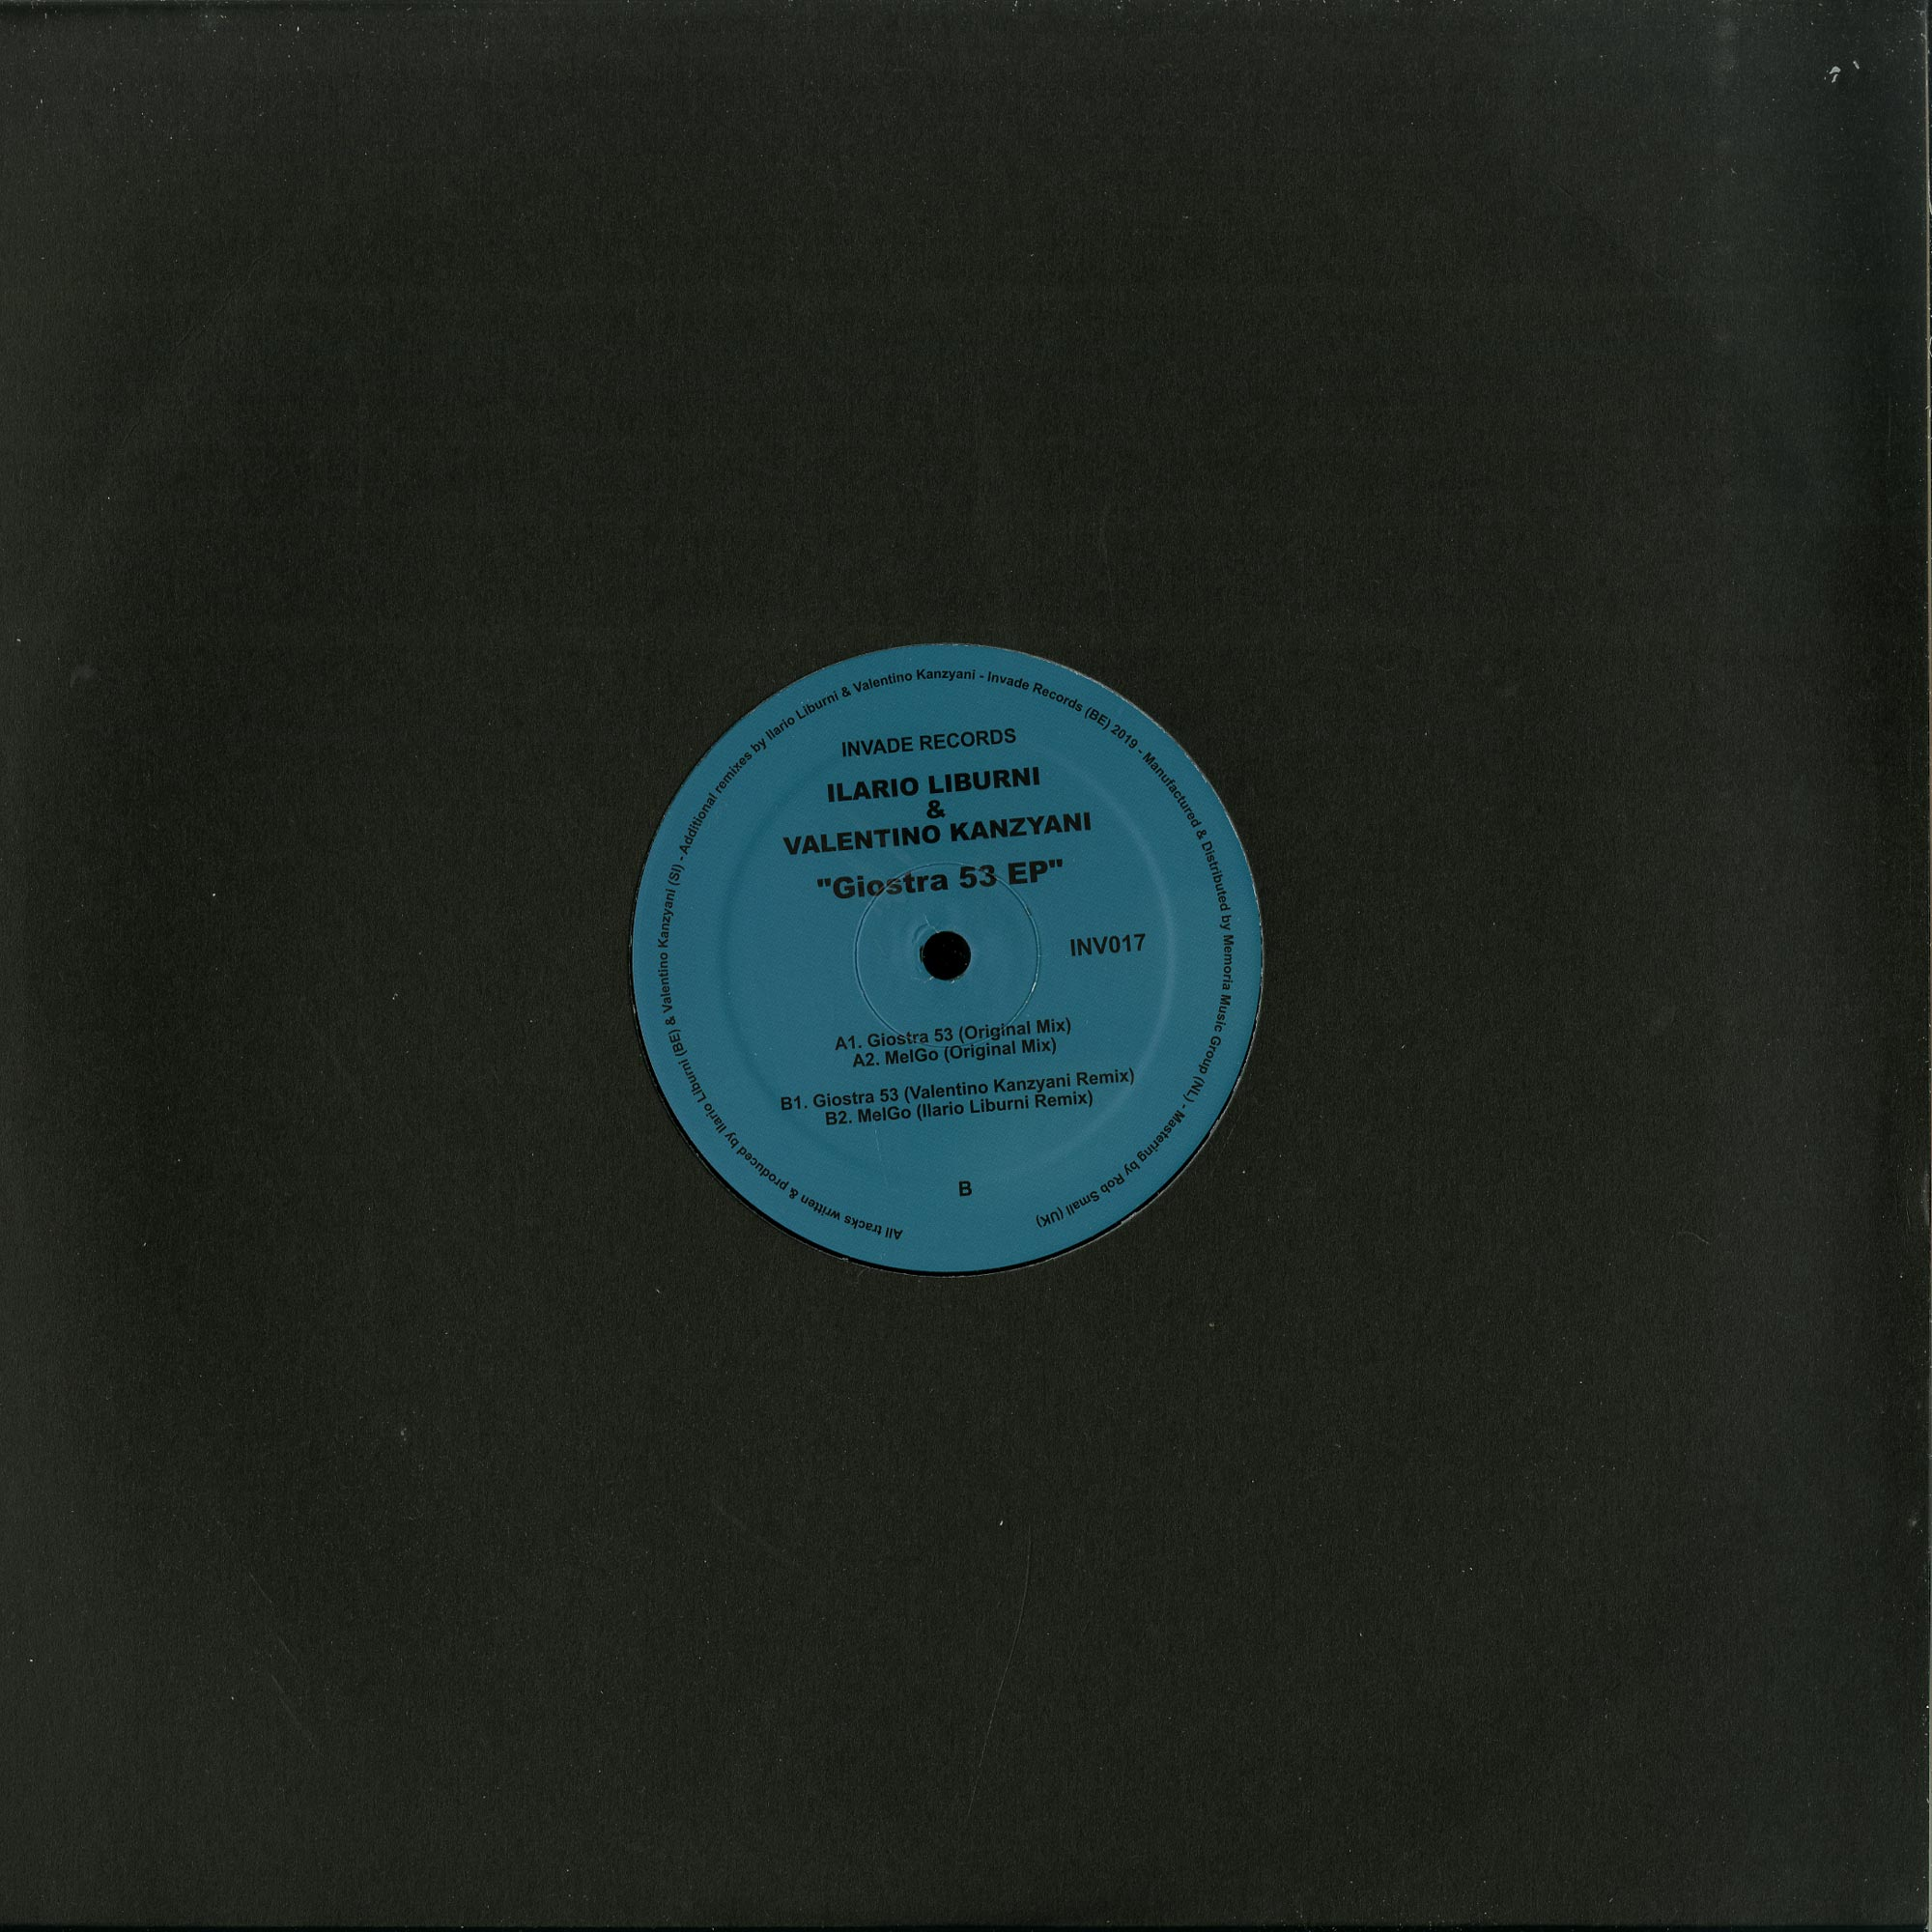 Ilario Liburni / Valentino Kanzyani - GIOSTRA 53 EP